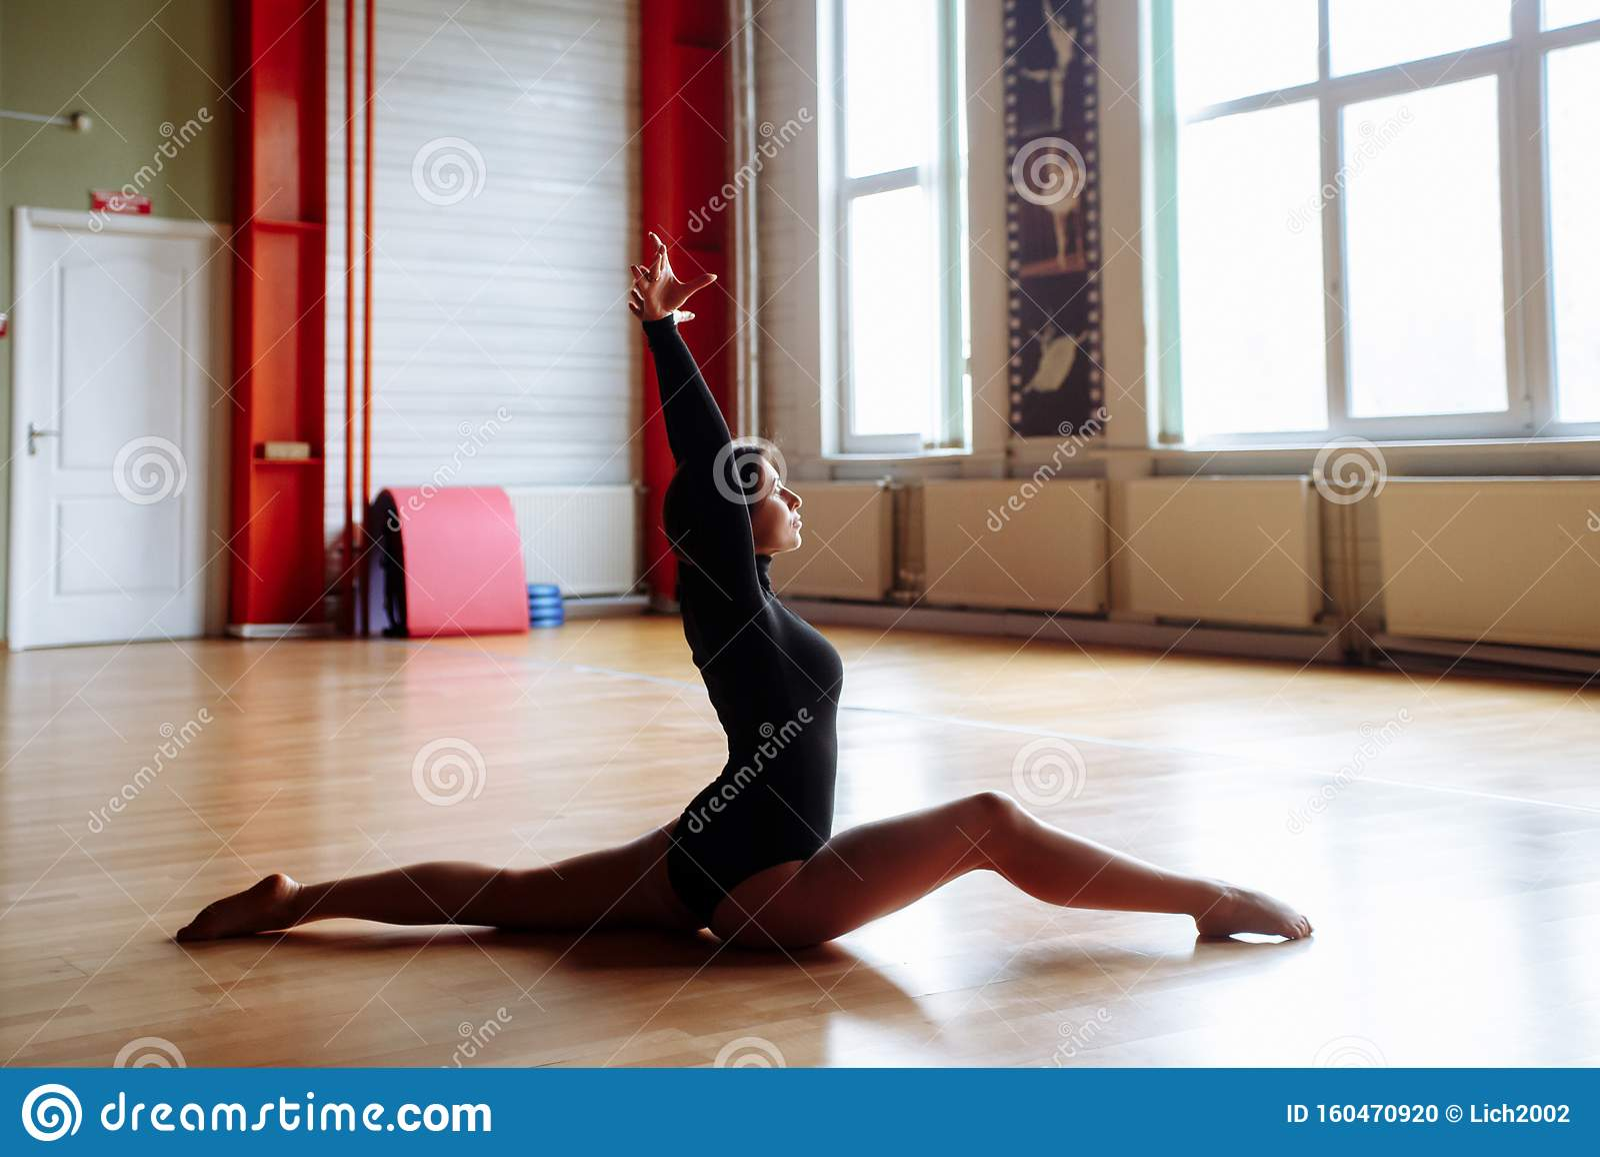 Hots Naked Gymnast Doing Split HD